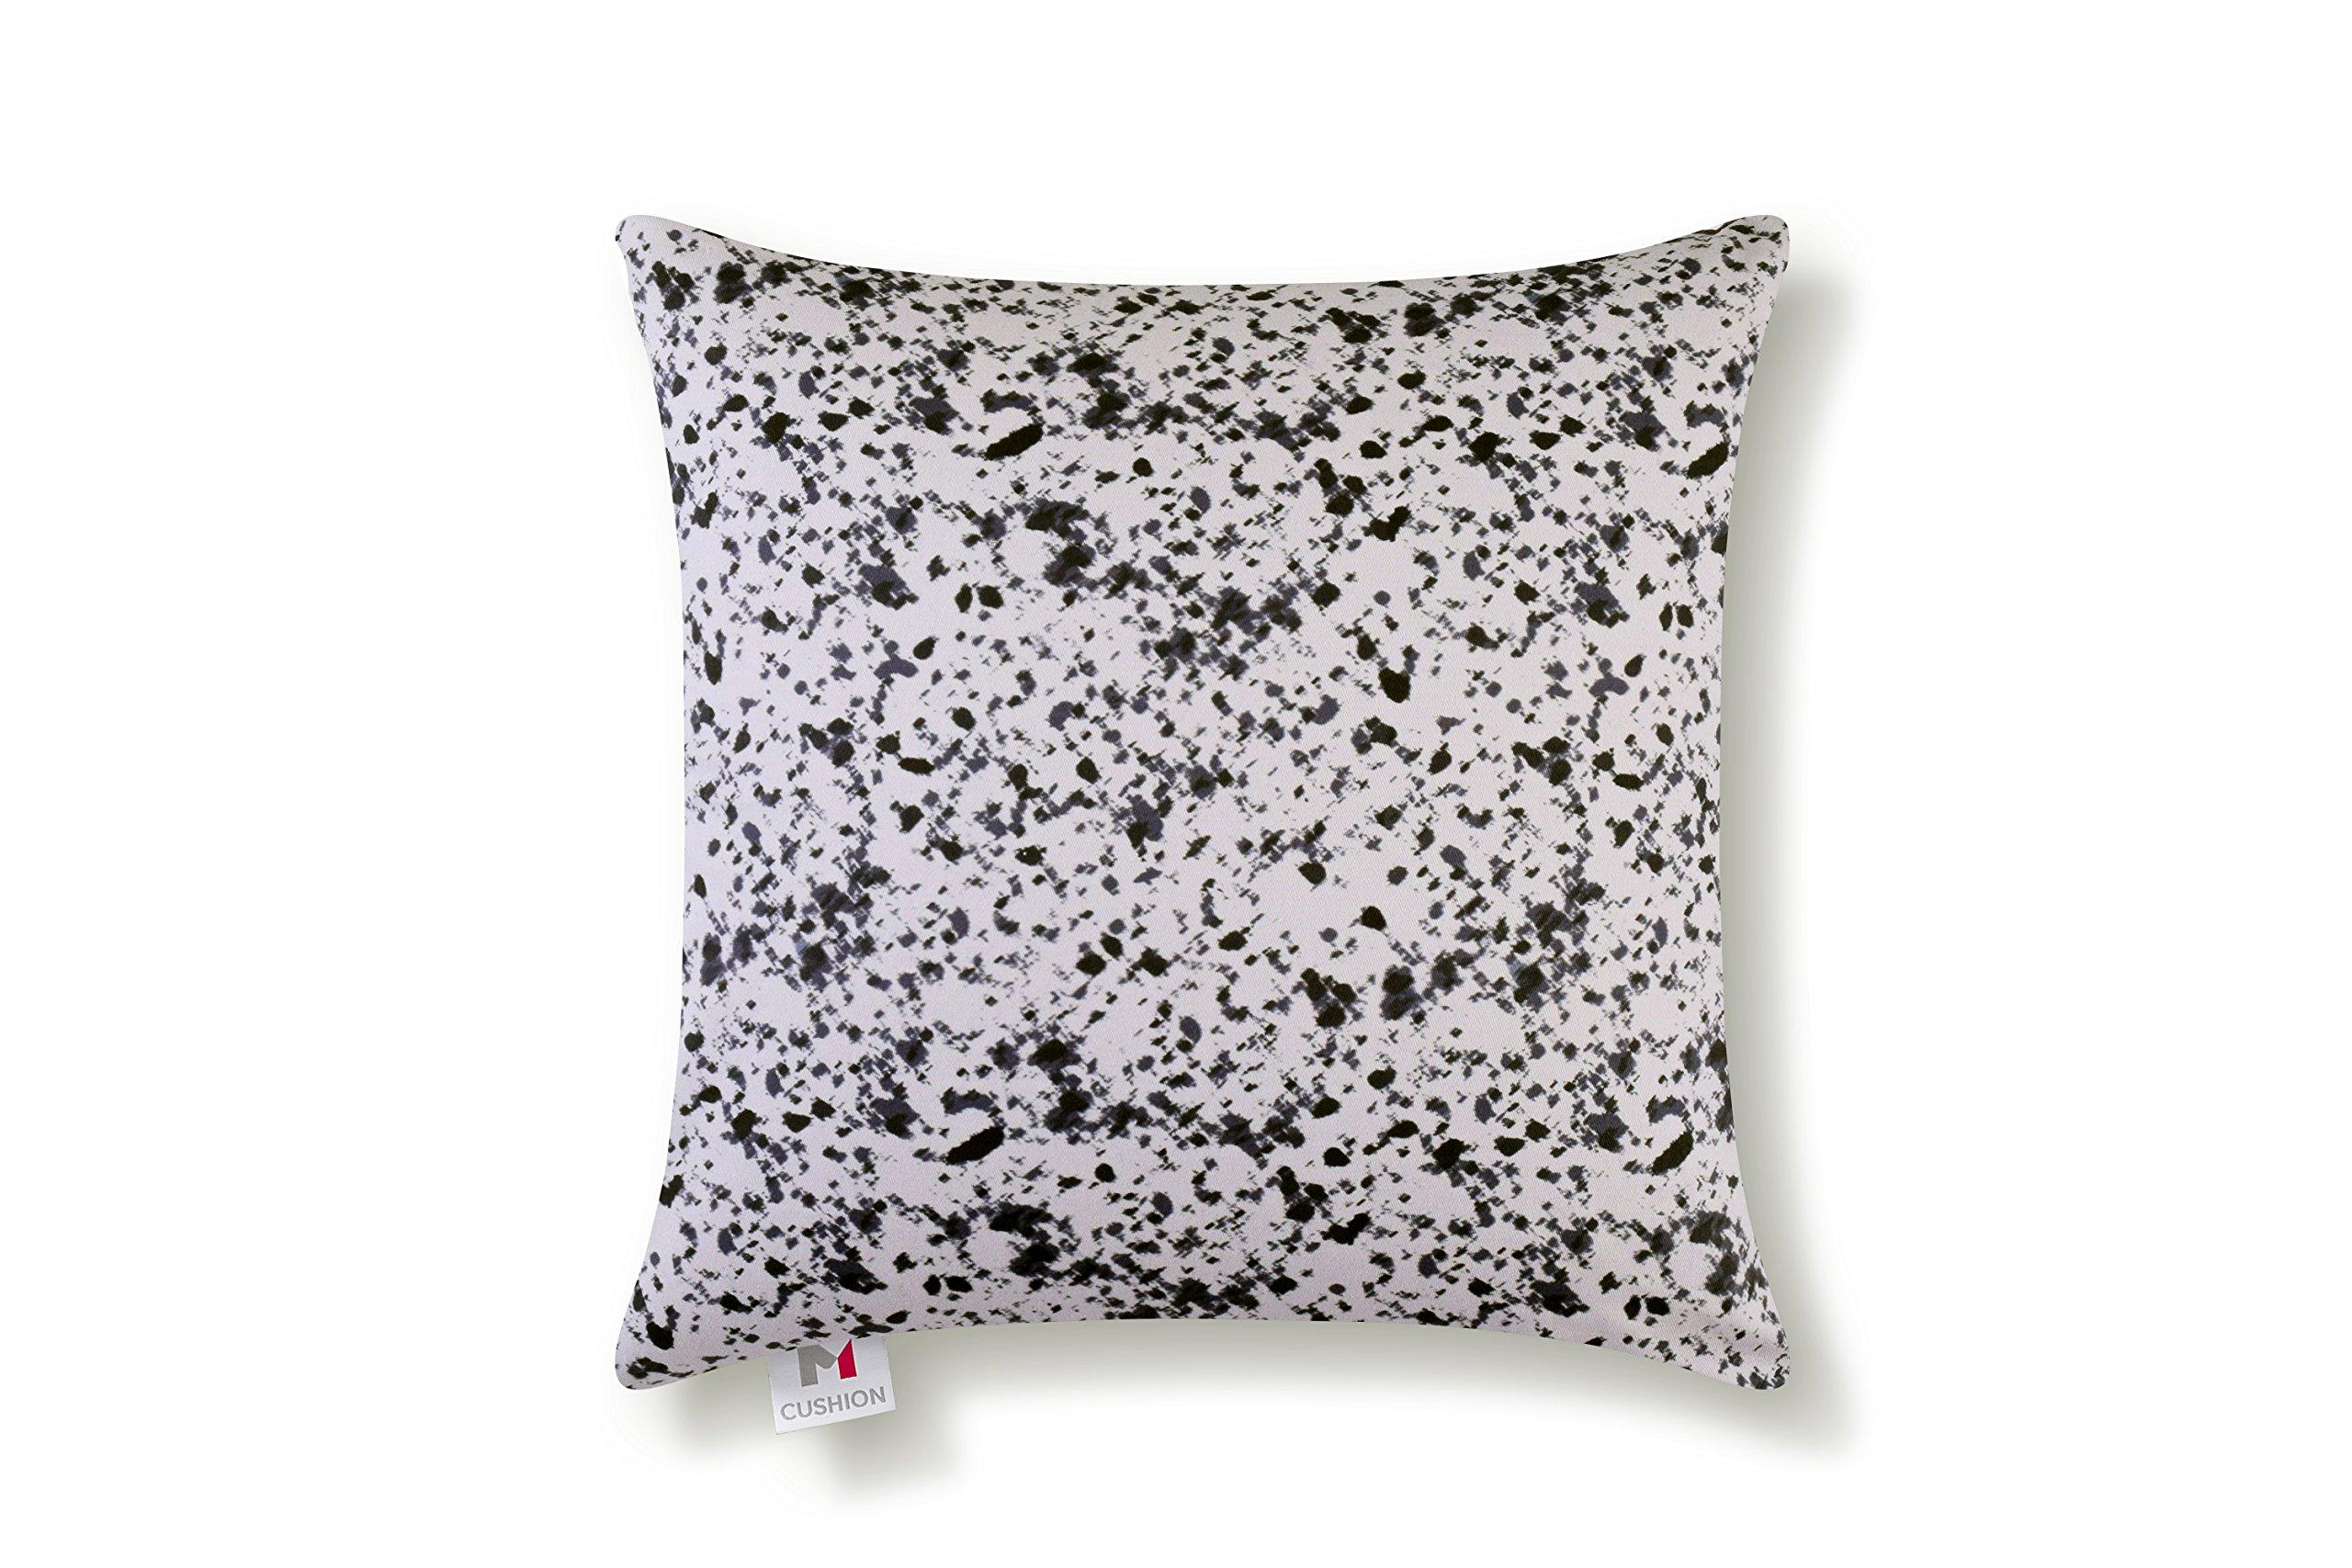 M Cushion 18'' Premium Plus Massage Cushion Shiatsu, Grey Granite